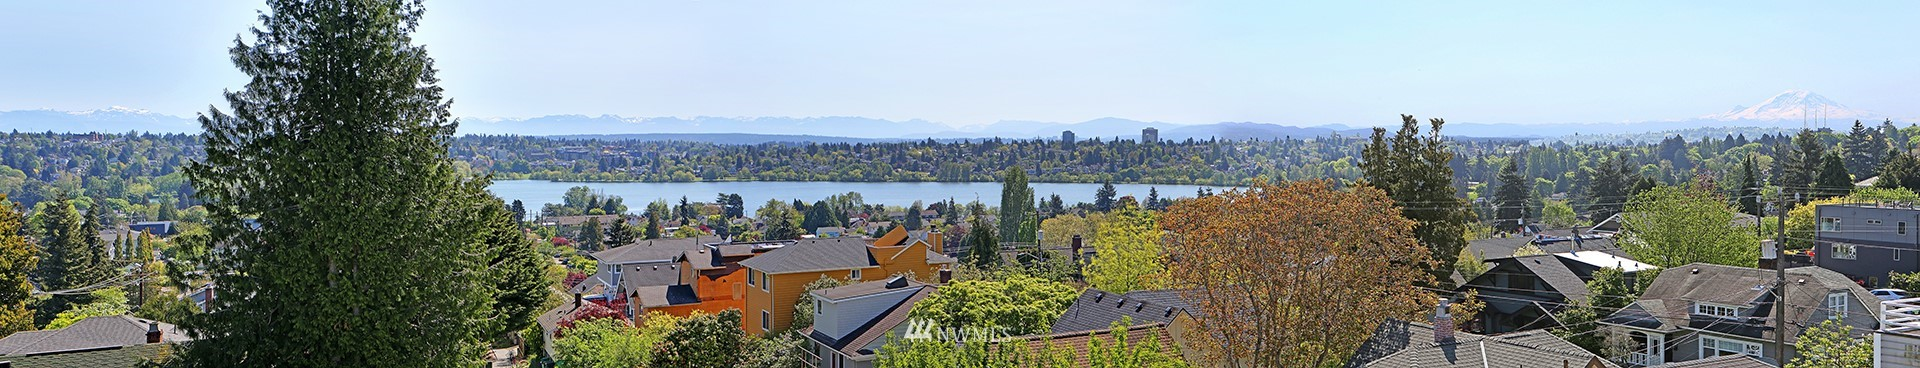 Sold Property | 7116 Greenwood Avenue N #403 Seattle, WA 98103 6